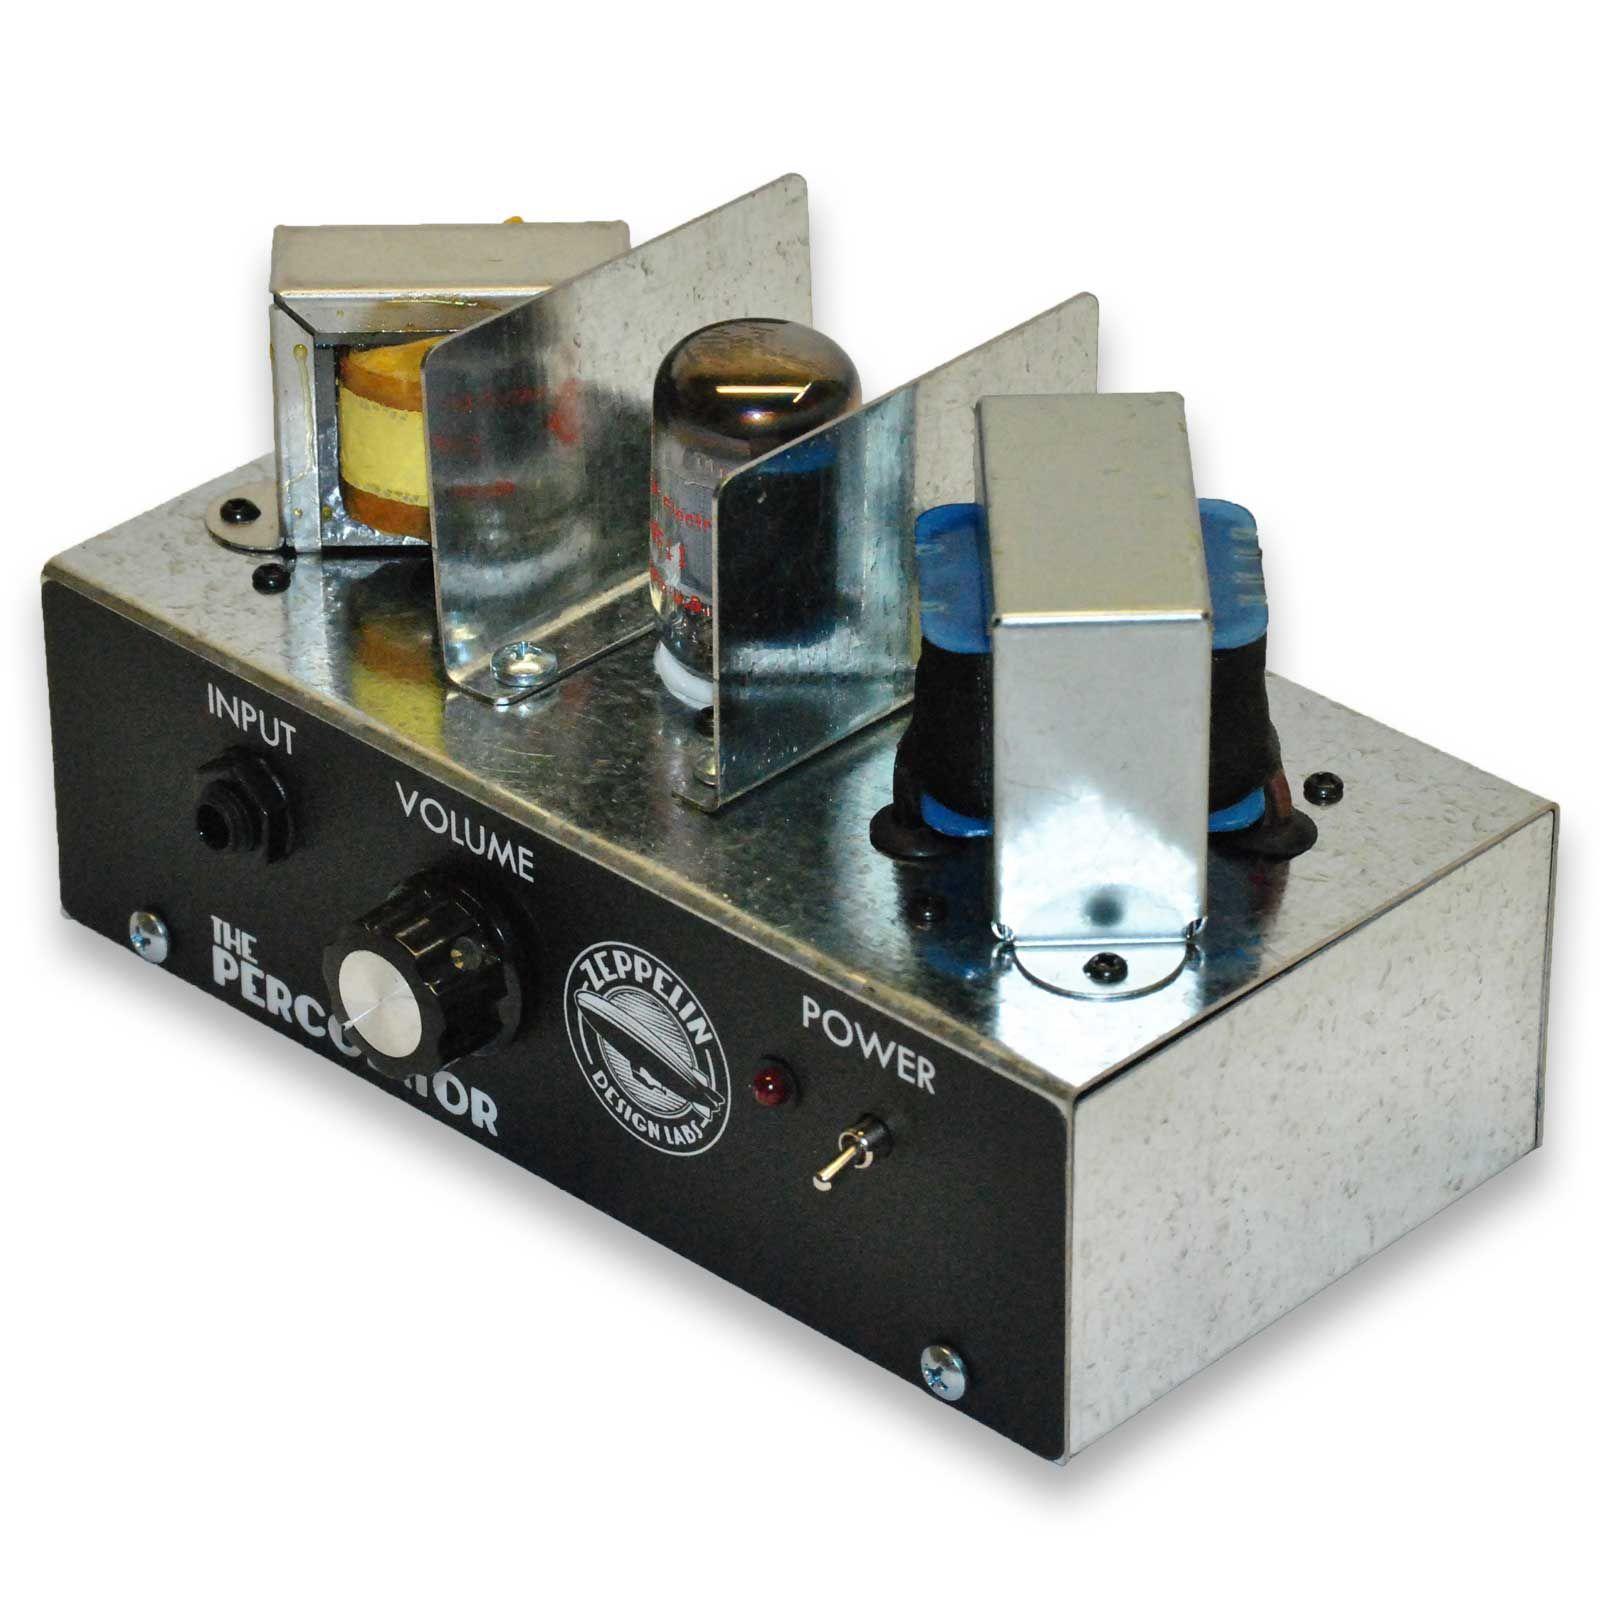 Small Diy Tube Amp Kit For Guitar Cigar Box Guitar And Harmonica